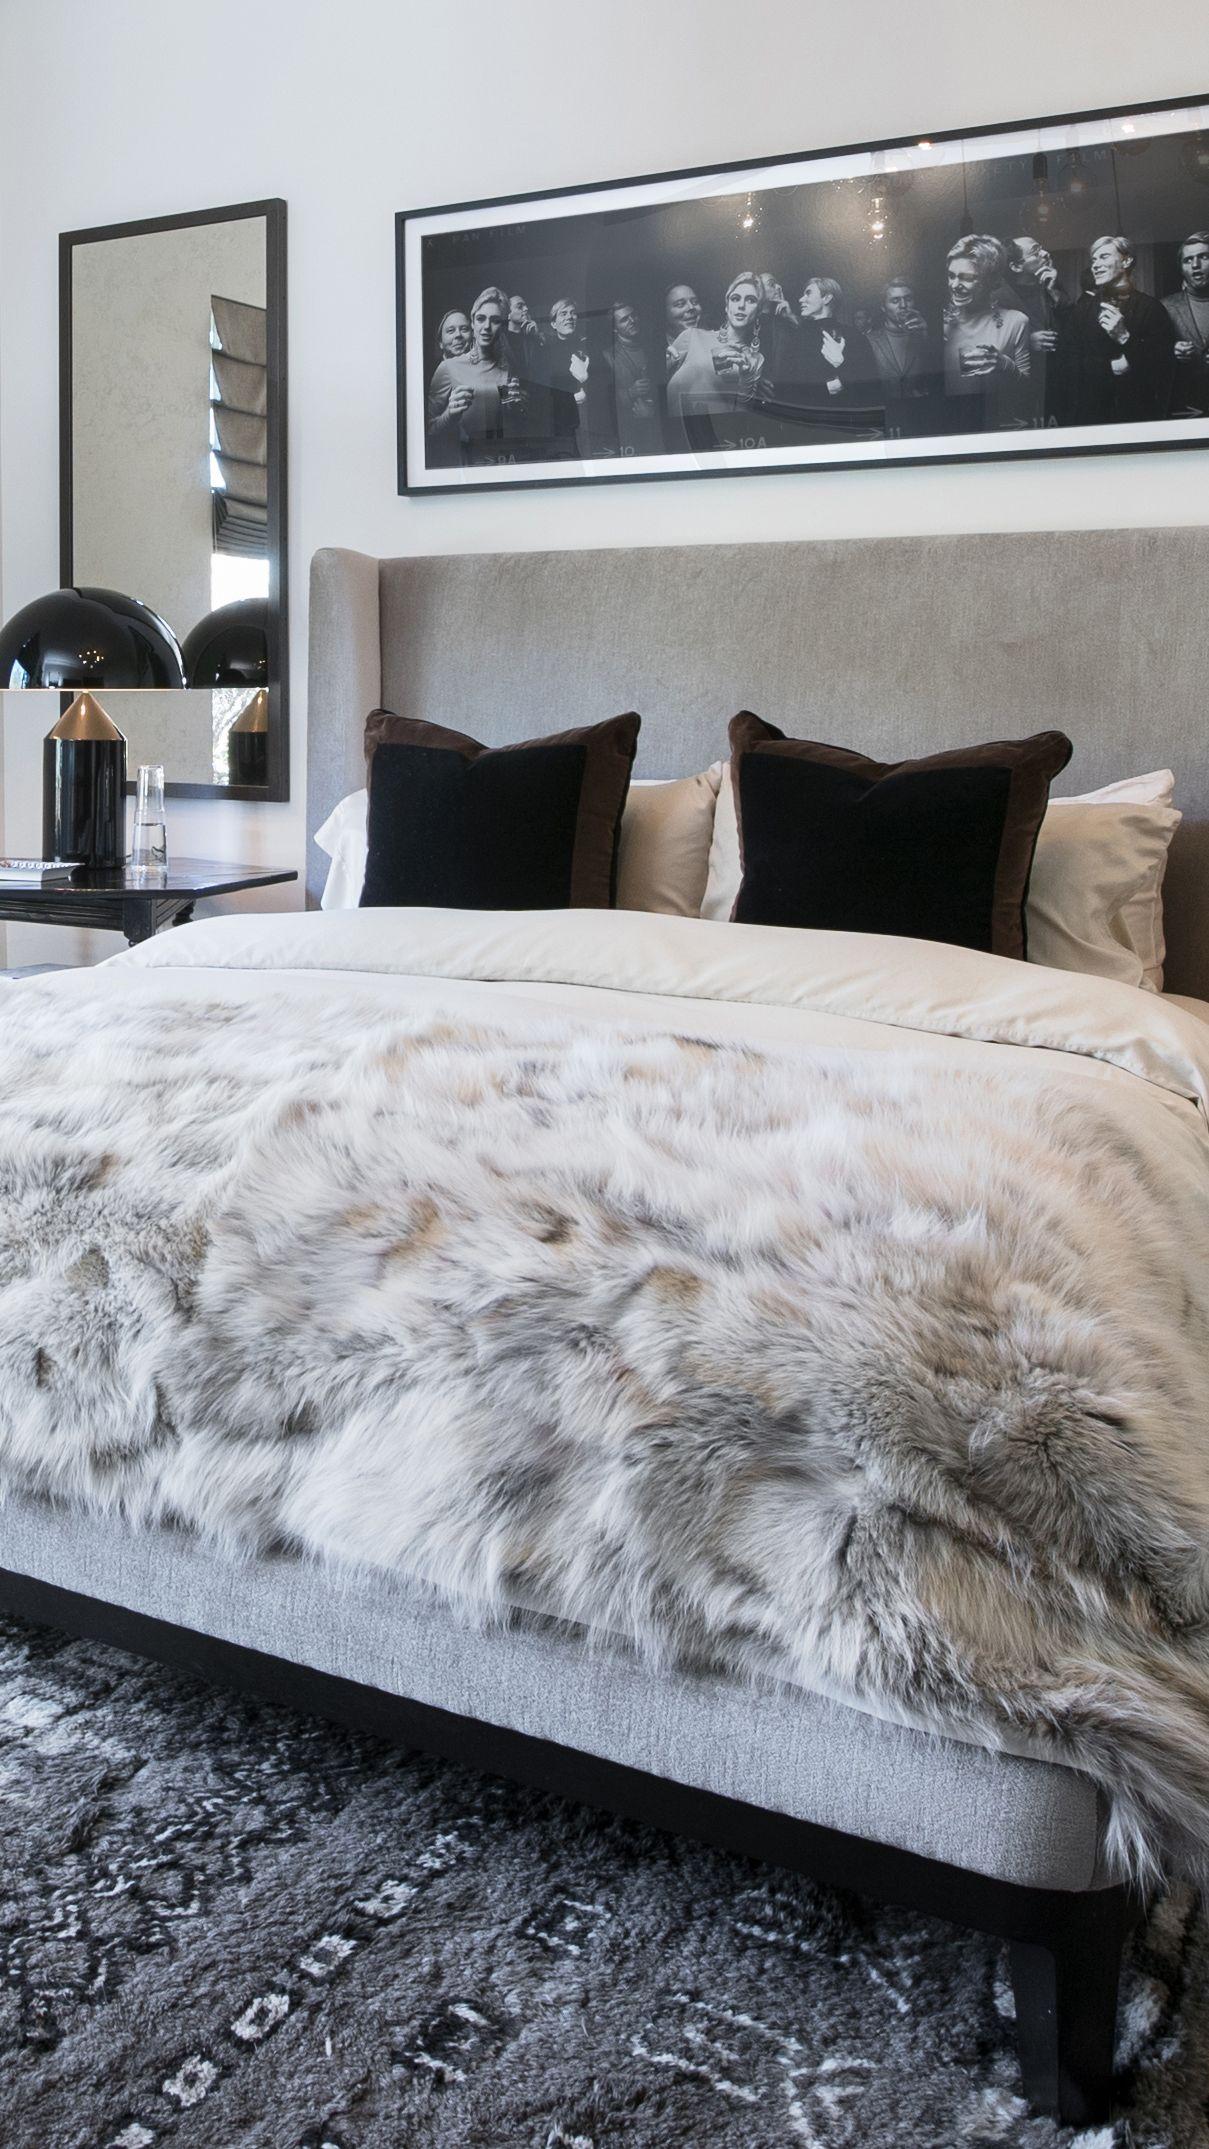 Best My Guest Room At Home Kourtney Kardashian 2018 In 2019 400 x 300